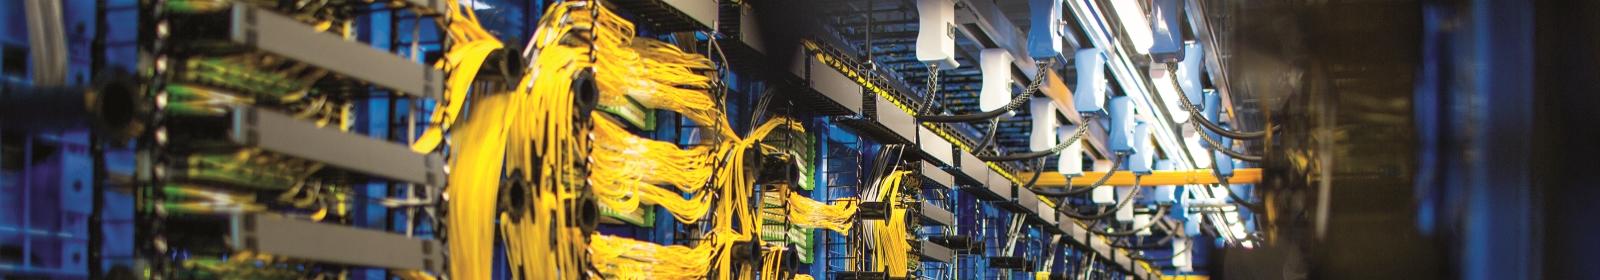 Server wires.